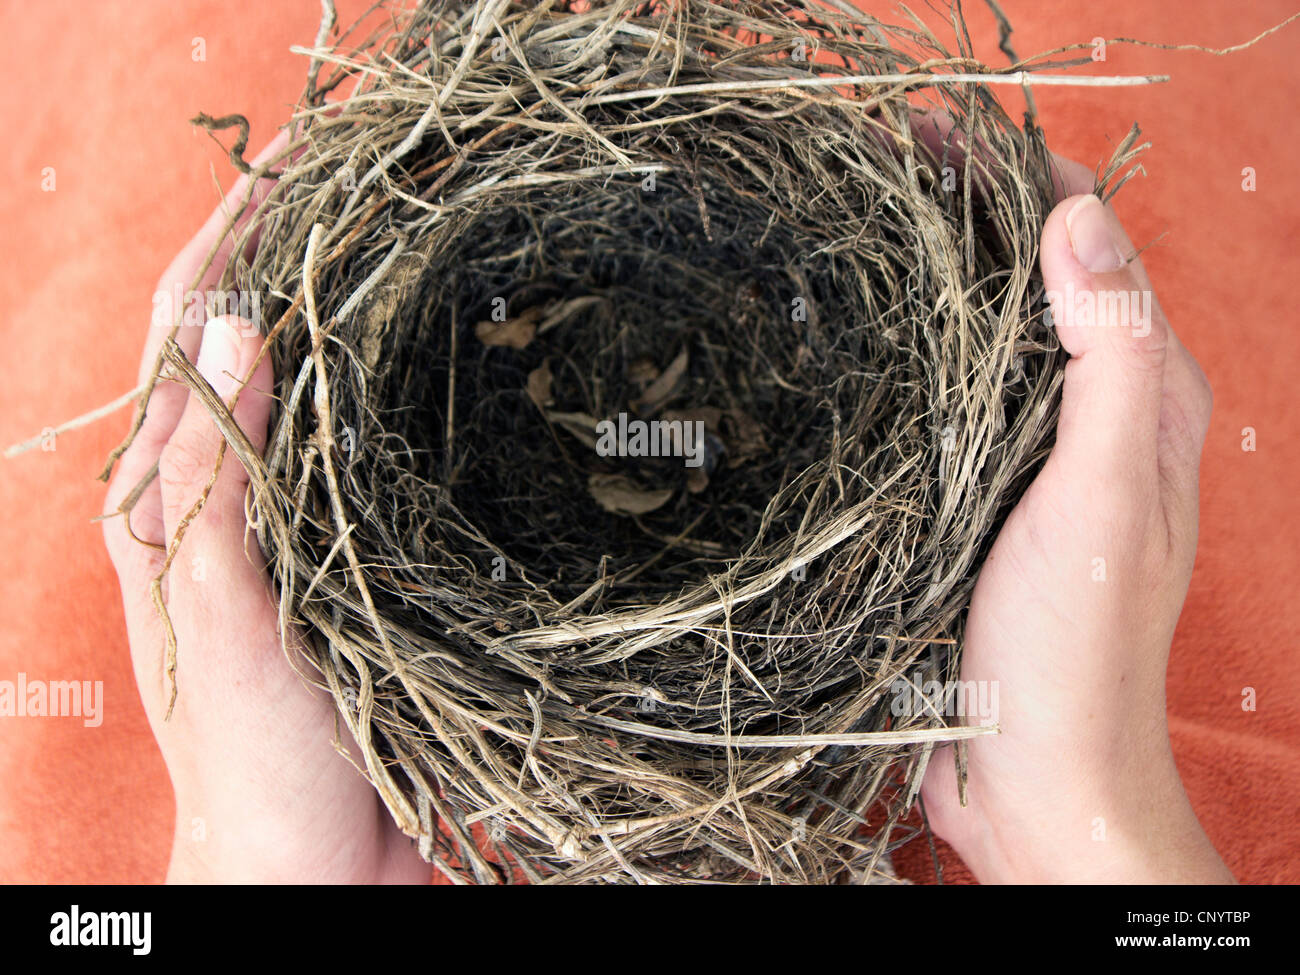 Hands holding empty nest. - Stock Image